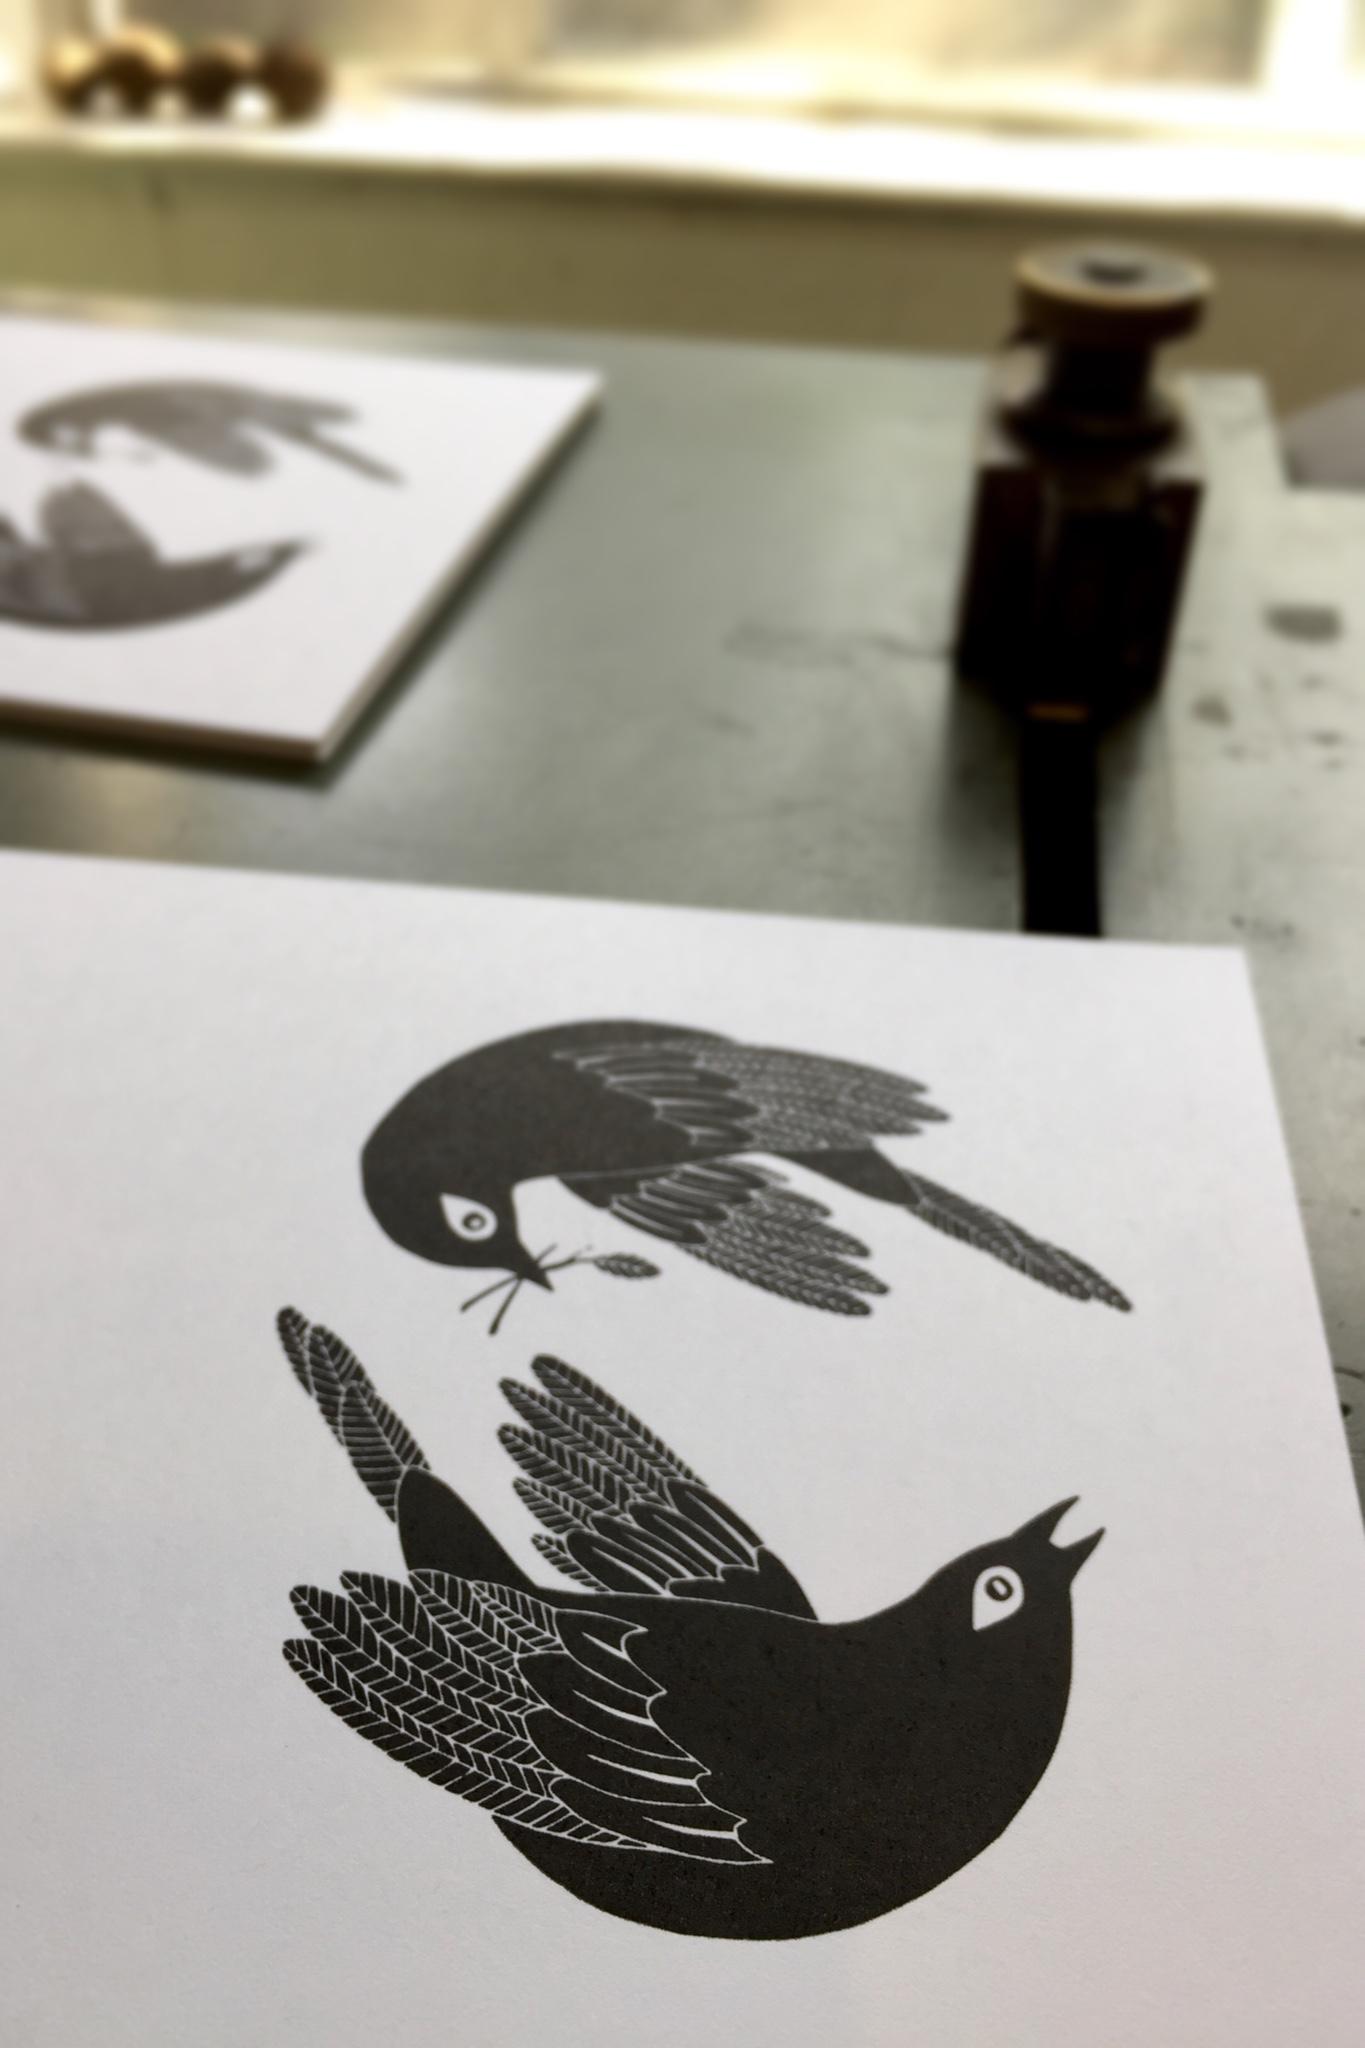 First ink color printed in black - Tiger Food Press